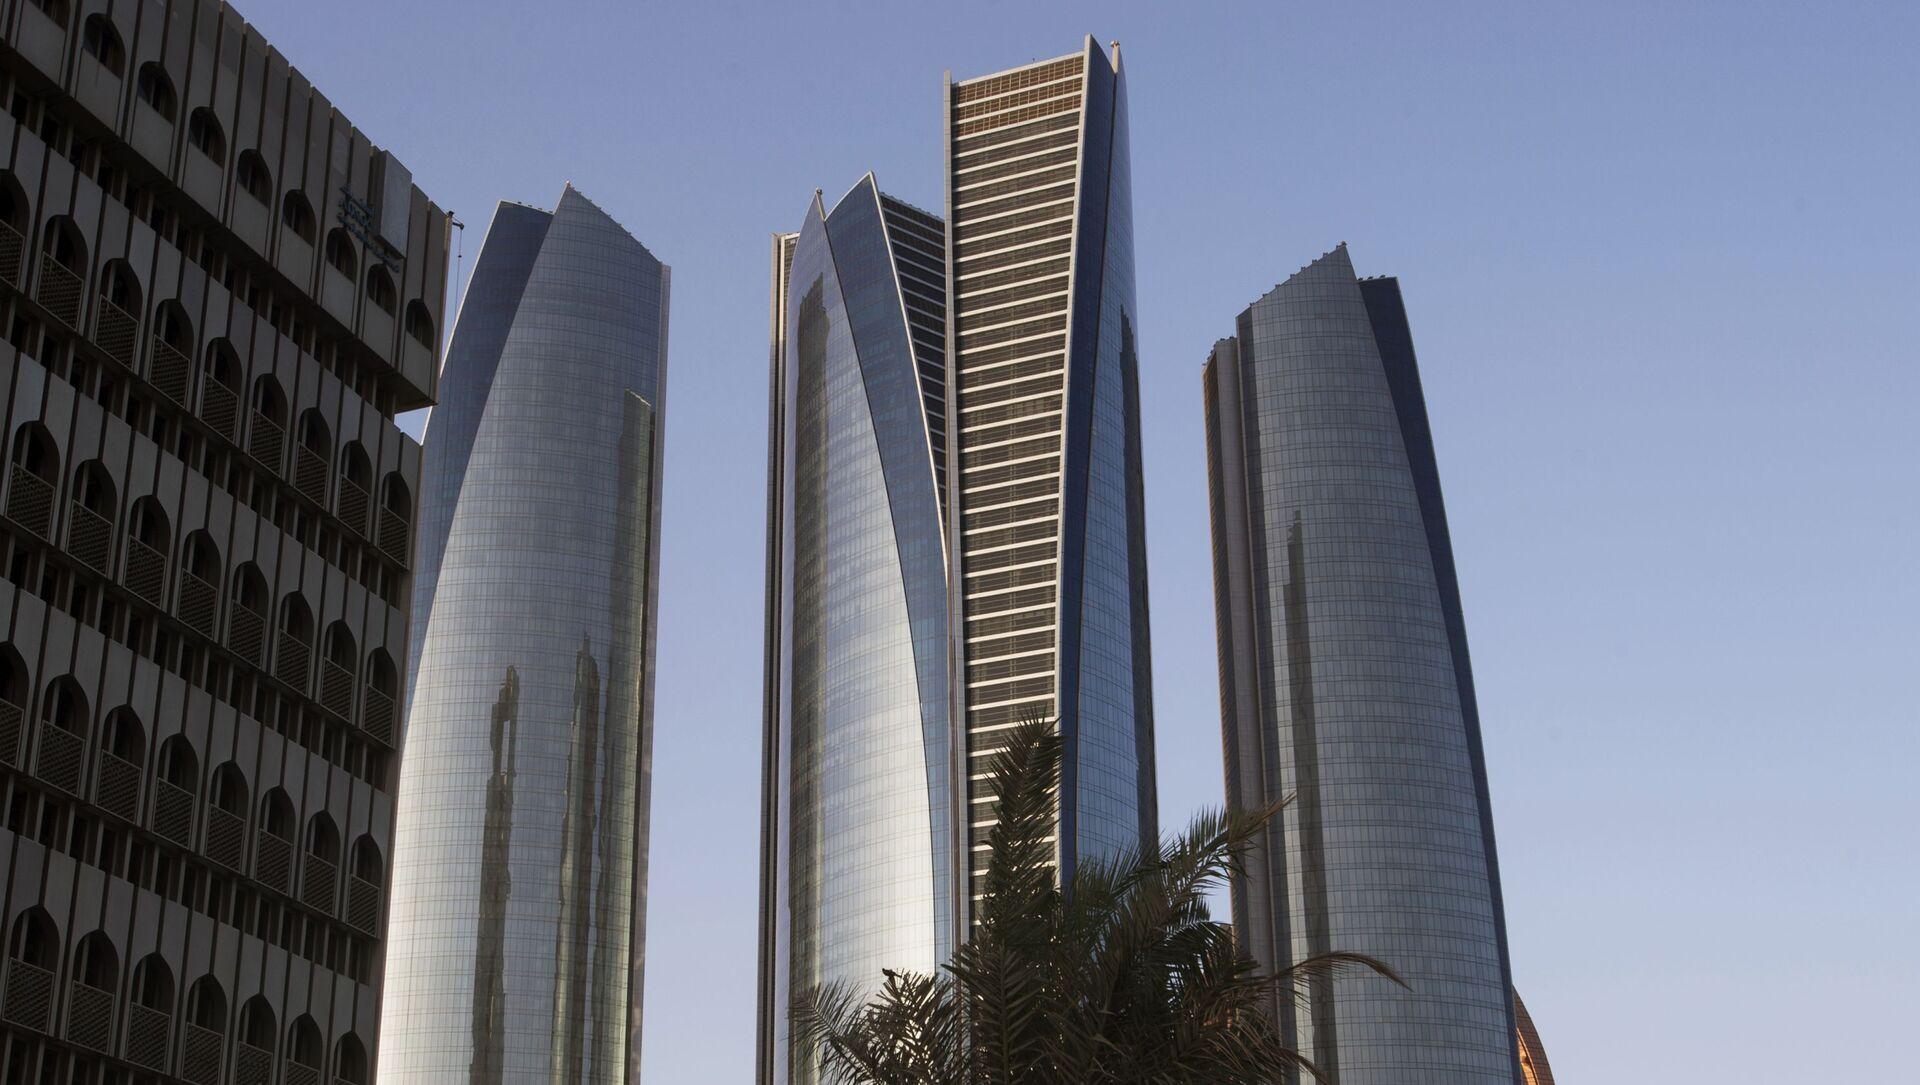 Abu Dhabi, la capitale degli Emirati Arabi Uniti - Sputnik Italia, 1920, 11.05.2021